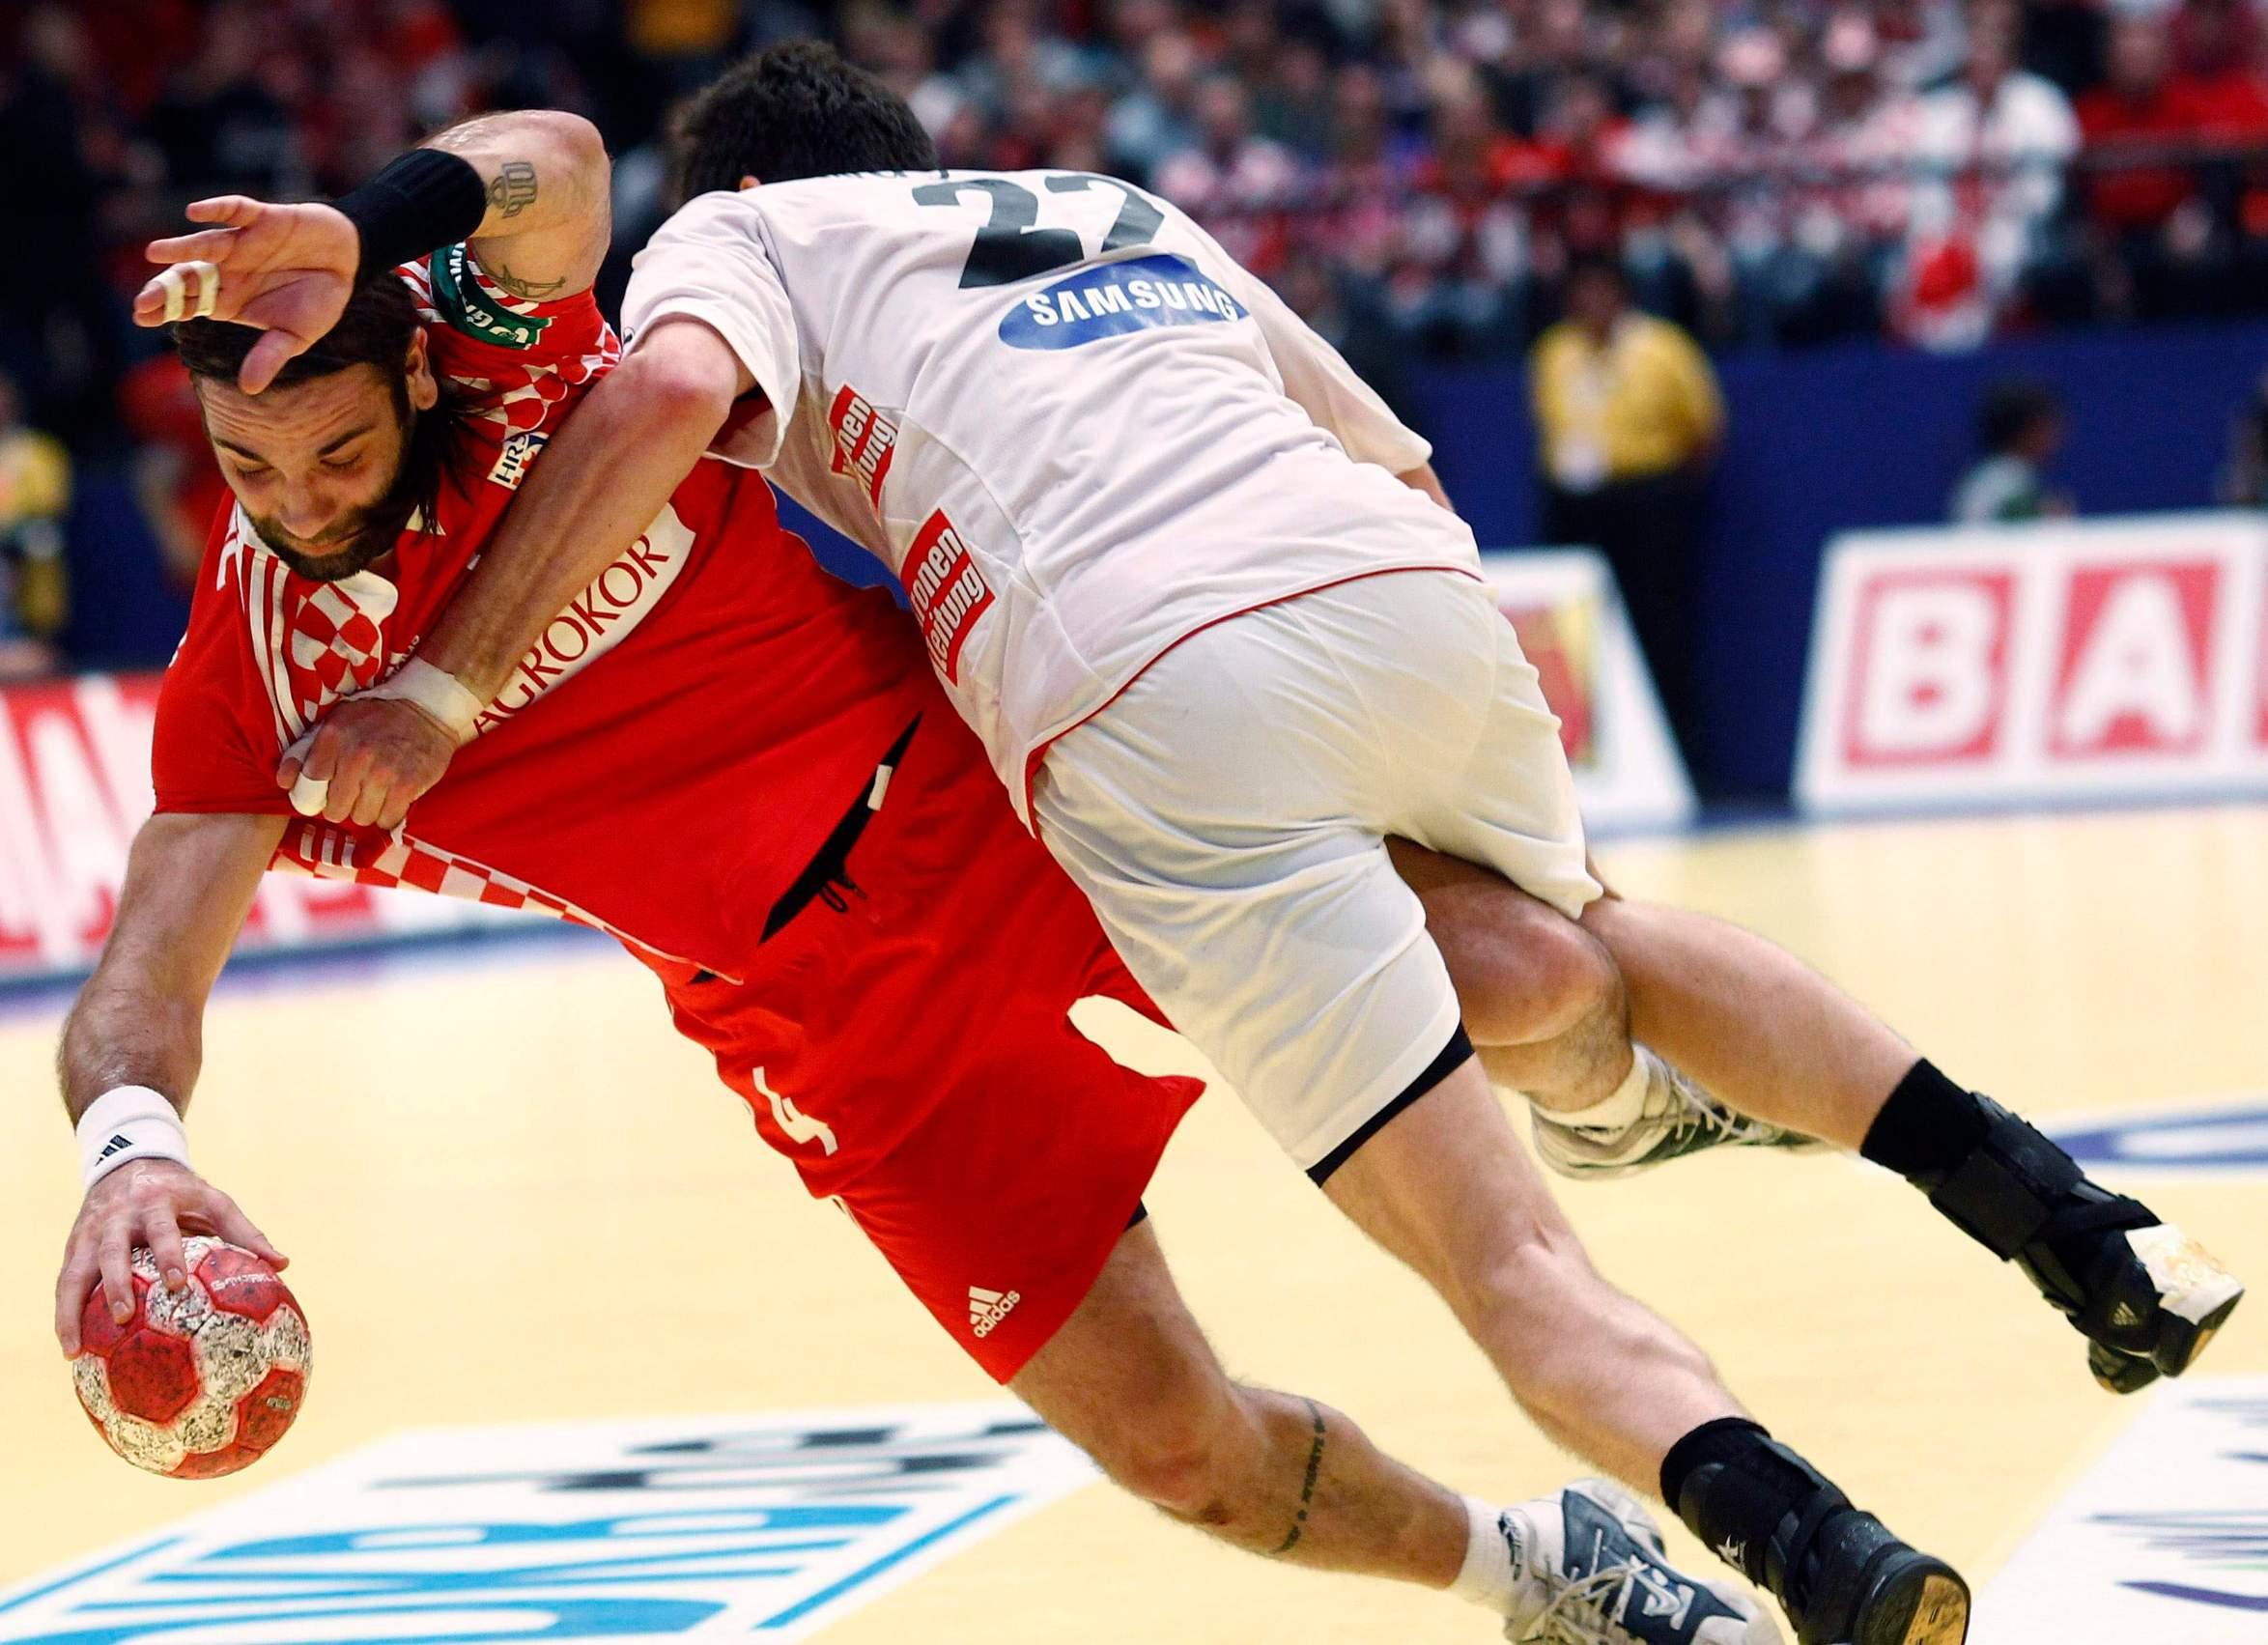 Austria's Markus Wagesreiter (R) tries to stop Croatia's Ivano Balic during their Men's European Handball Championship second round match in Vienna January 26, 2010. REUTERS/Murad Sezer (AUSTRIA - Tags: SPORT HANDBALL)